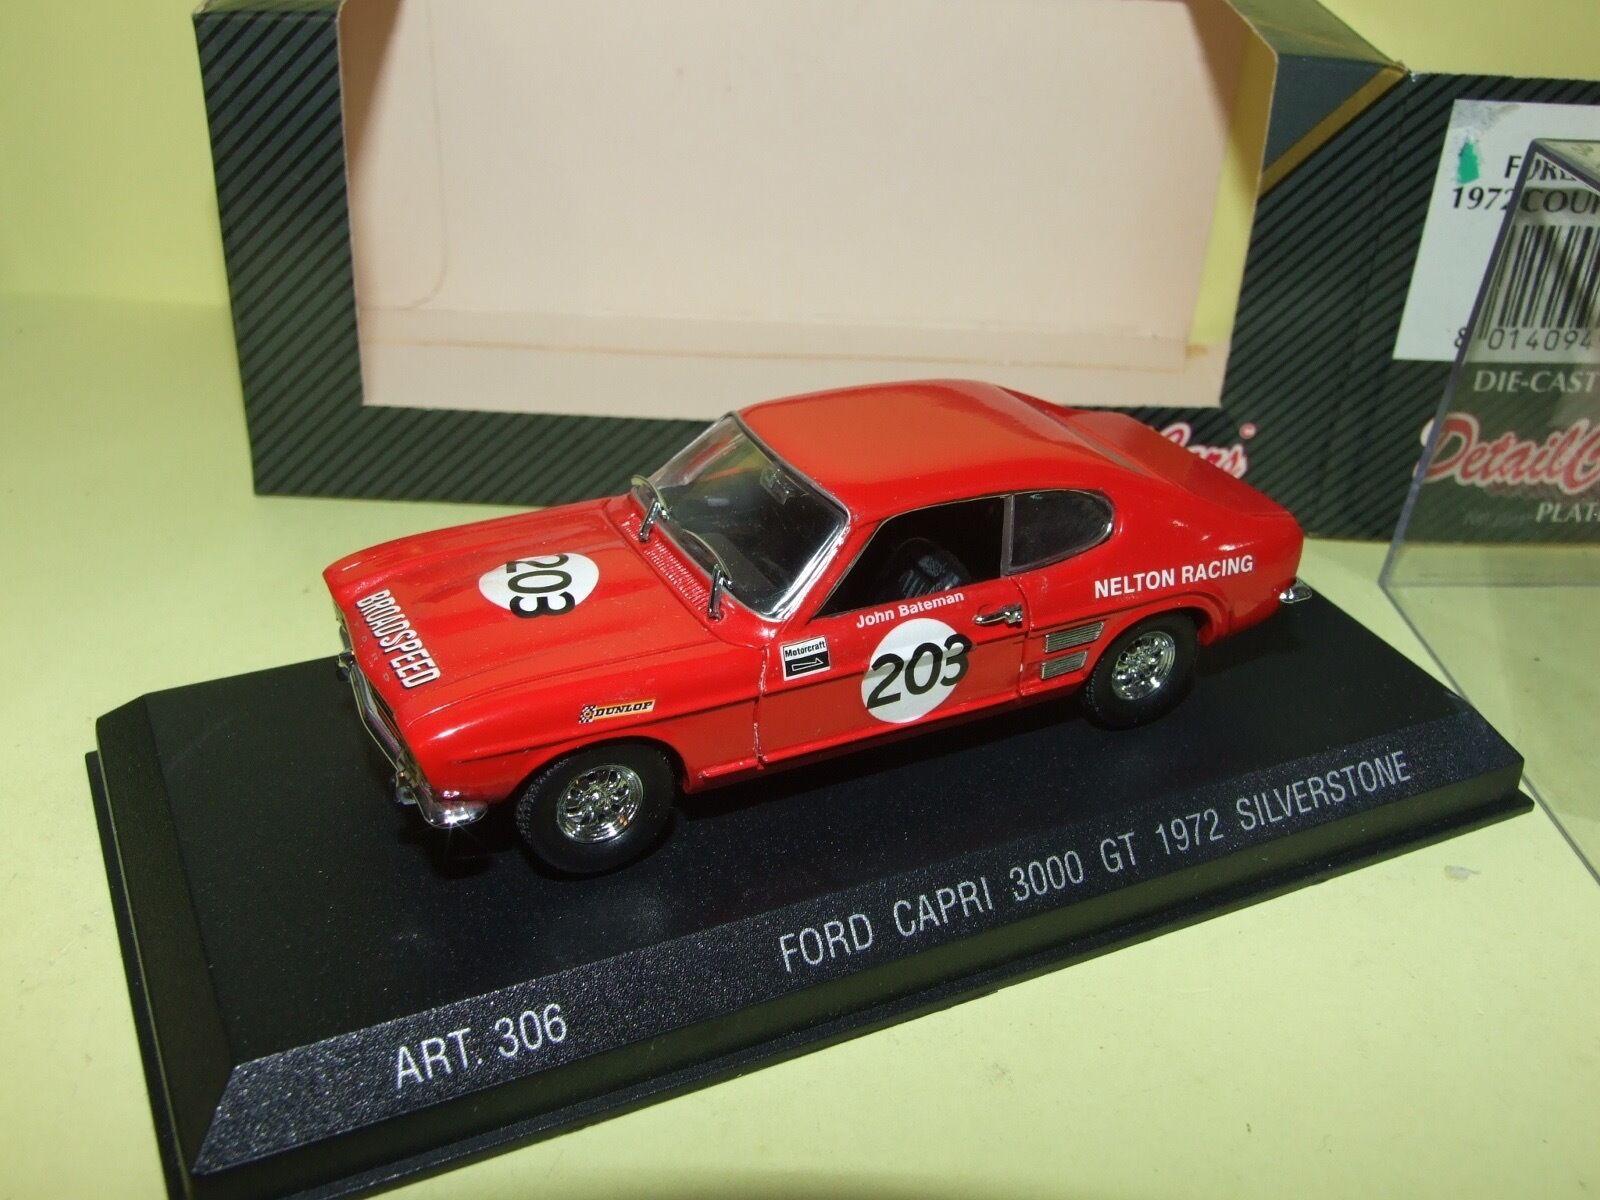 FORD CAPRI 2300 GT 1969 RALLYE TOUR DE FRANCE DETAILCARS 307 1 43